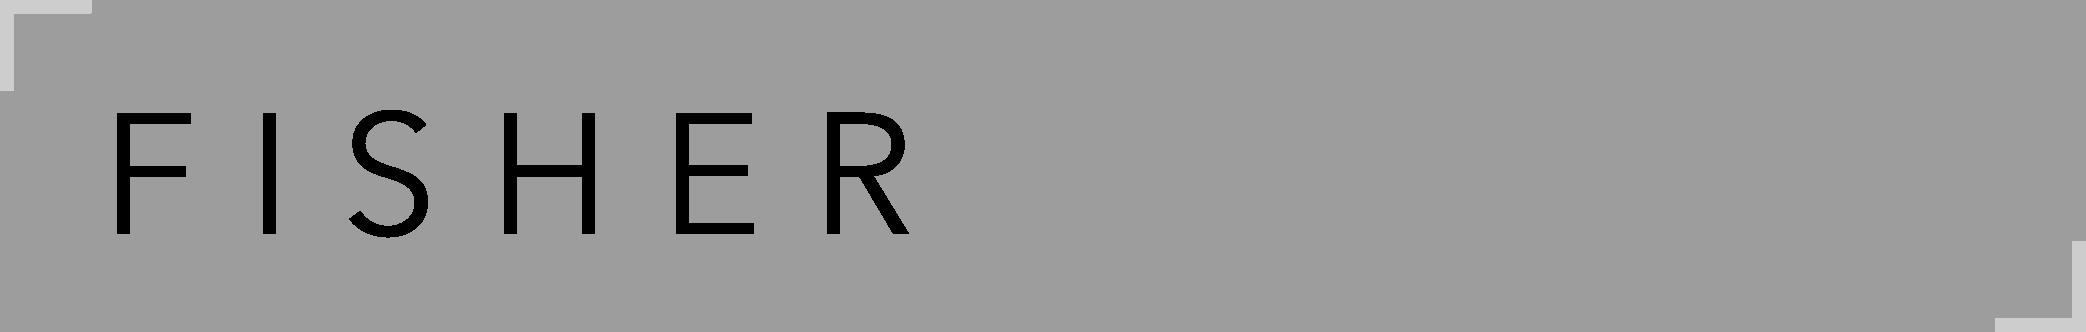 fisher-studios-logo-1